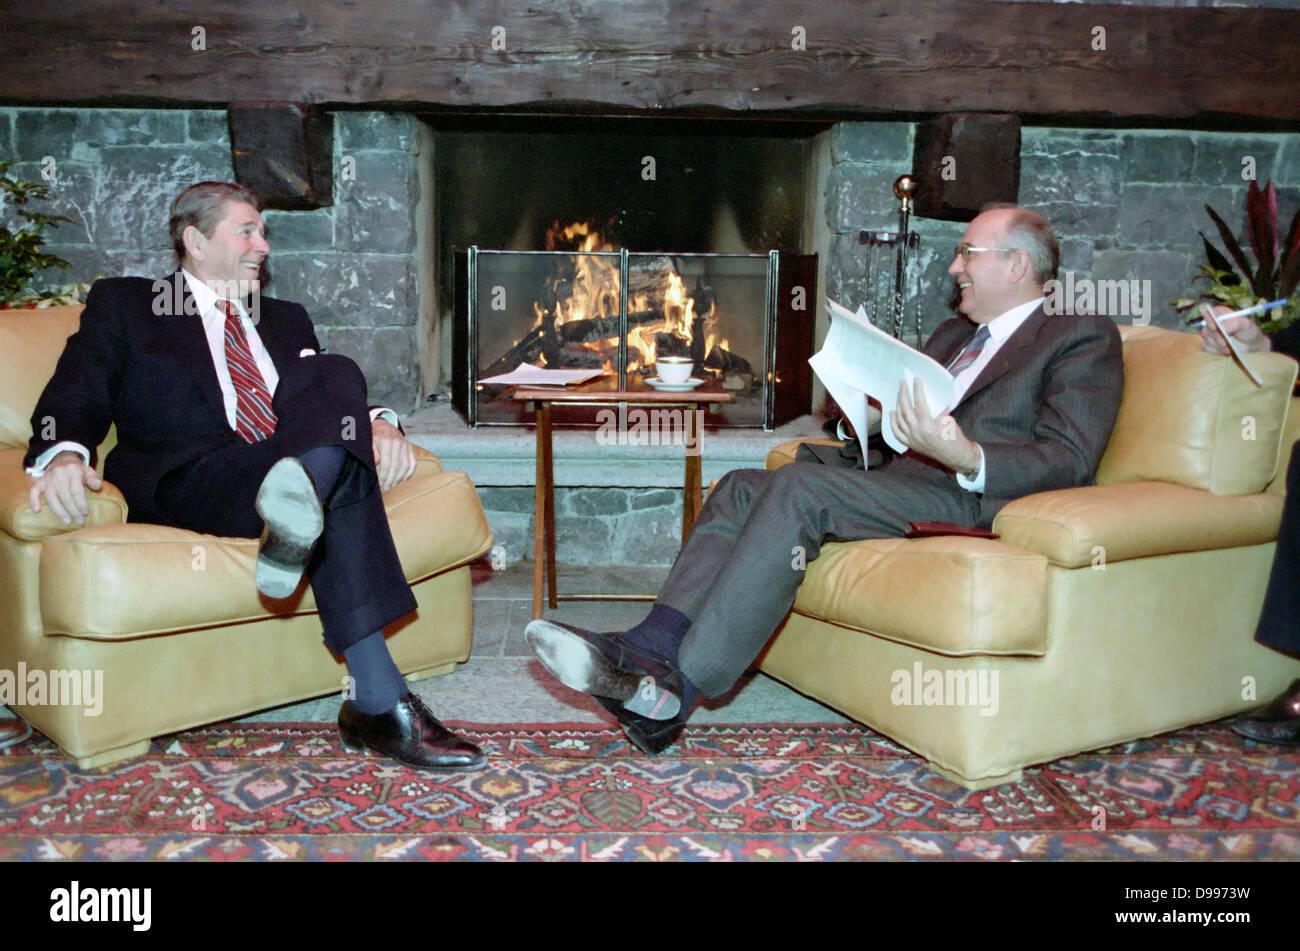 Soviet leader Mikhail Gorbachev and US President Ronald Reagan at the Geneva Summit 1986 - Stock Image